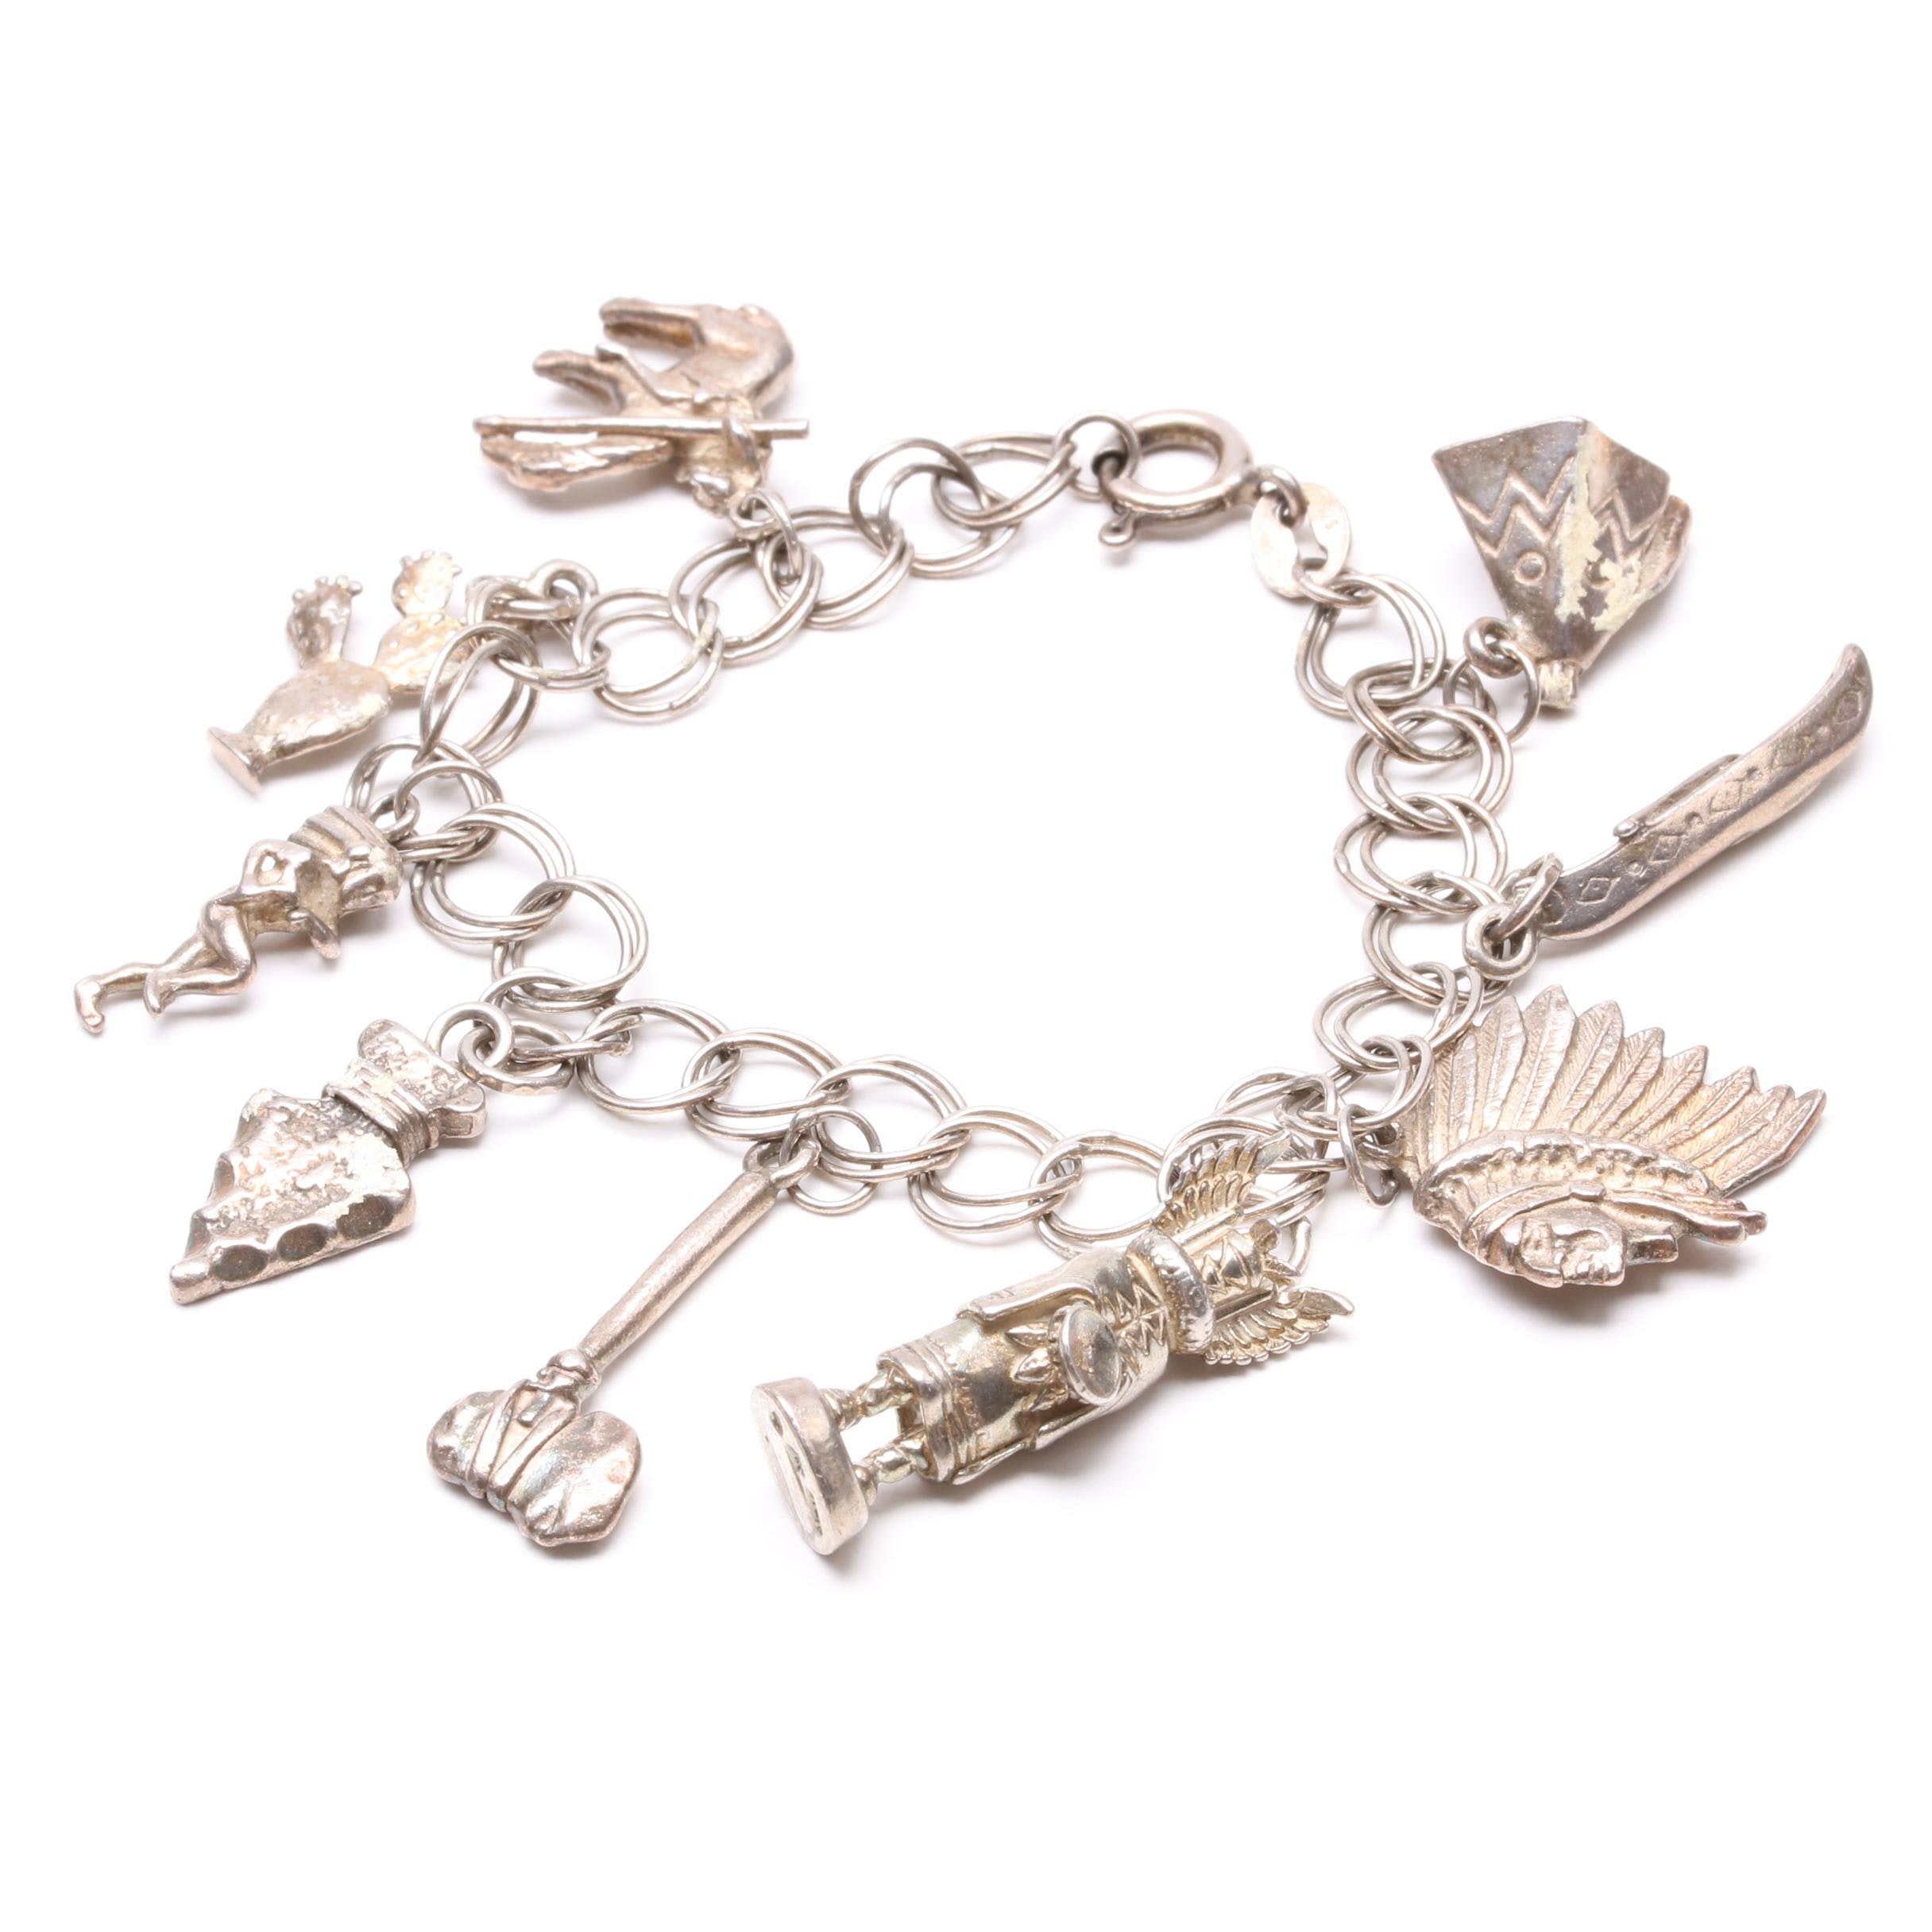 Sterling Silver Southwestern Themed Charm Bracelet